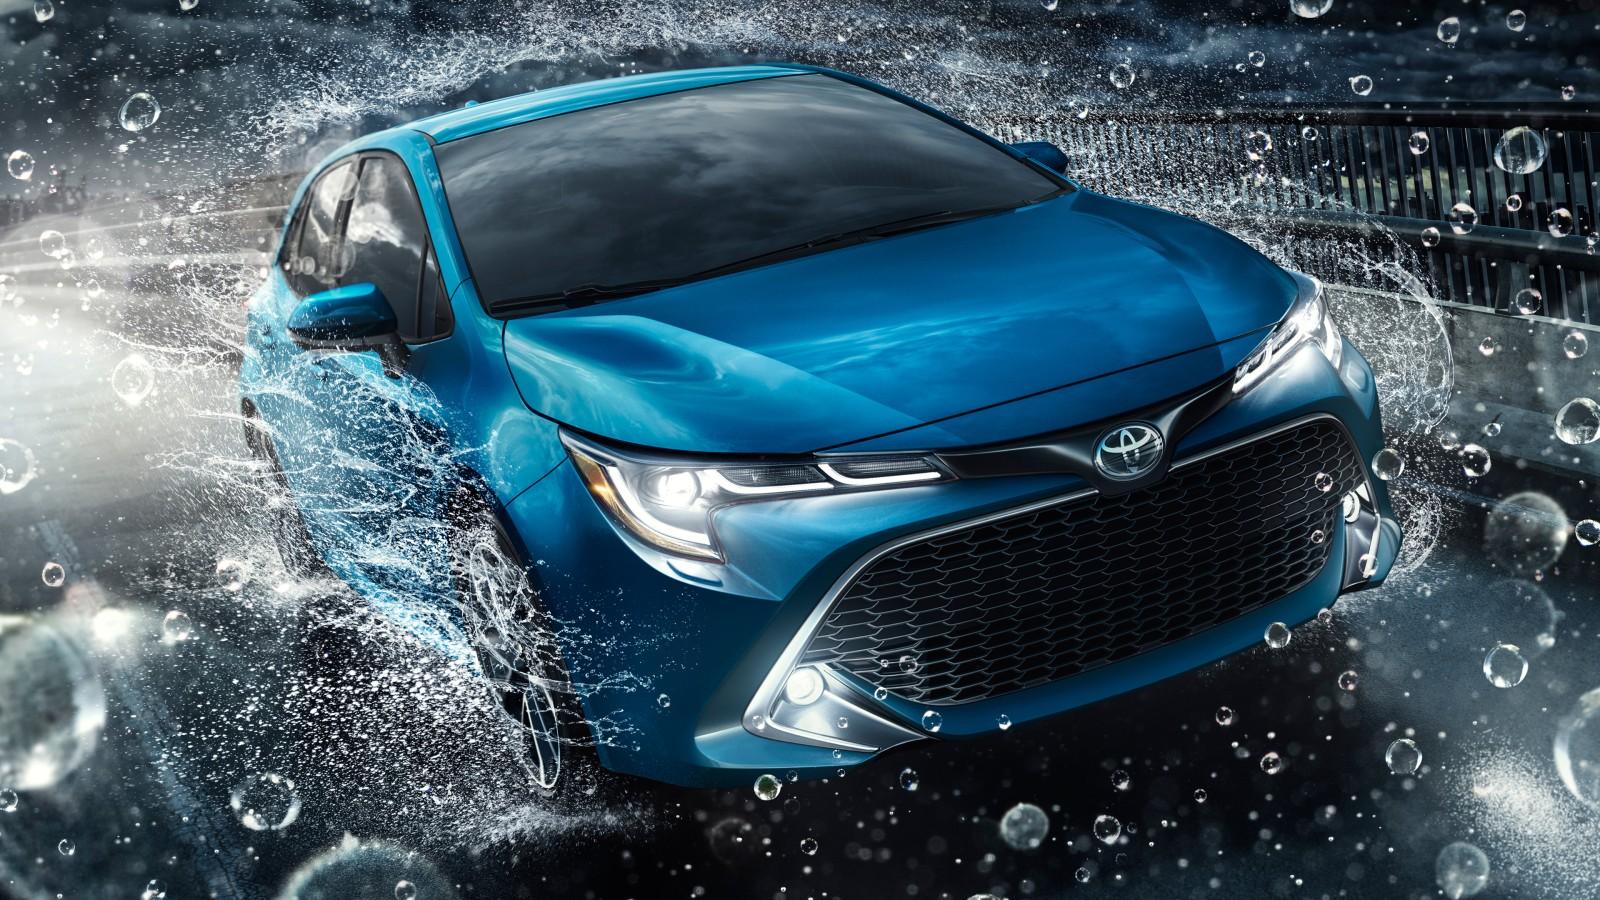 Supra Iphone Wallpaper 2019 Toyota Corolla Xse Hatchback 4k 2 Wallpaper Hd Car